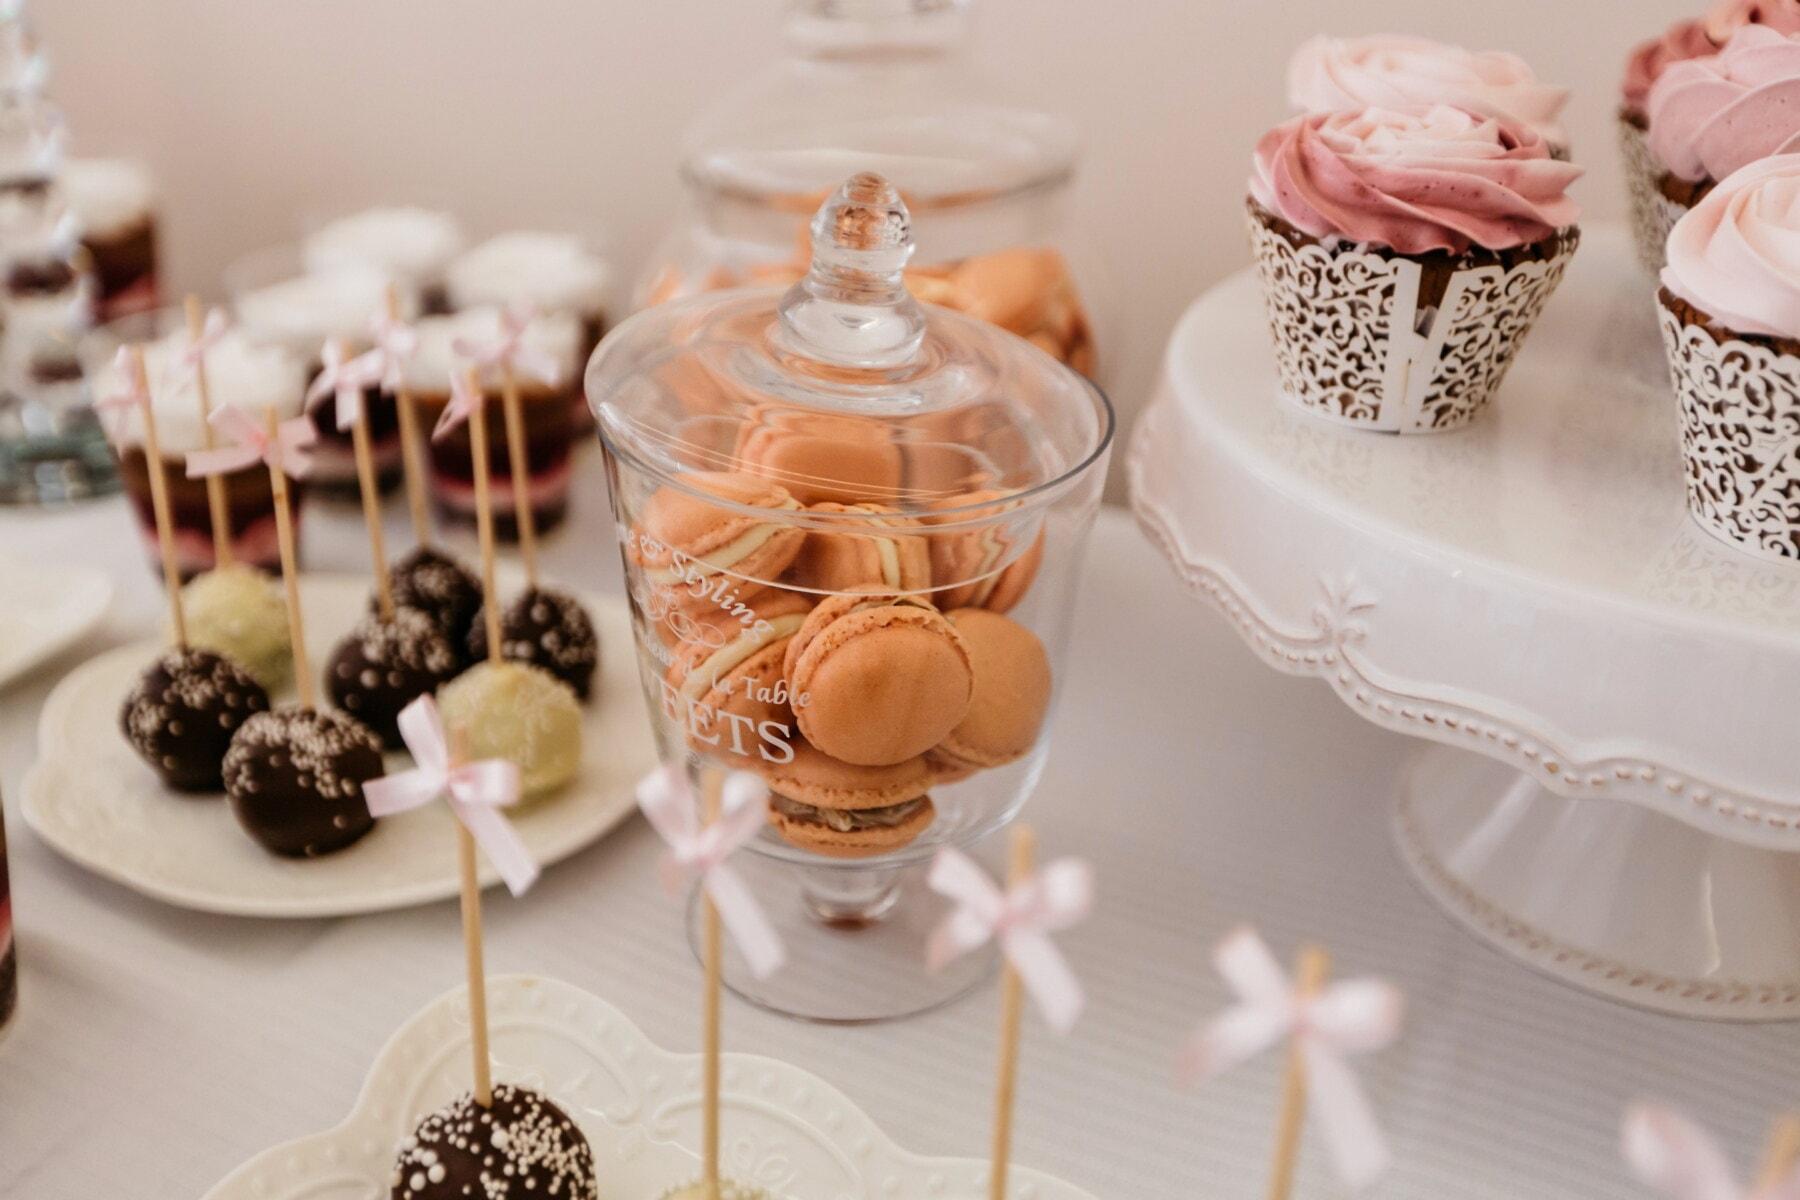 jar, crystal, biscuit, chocolate, glass, sugar, sweet, cream, candy, cake